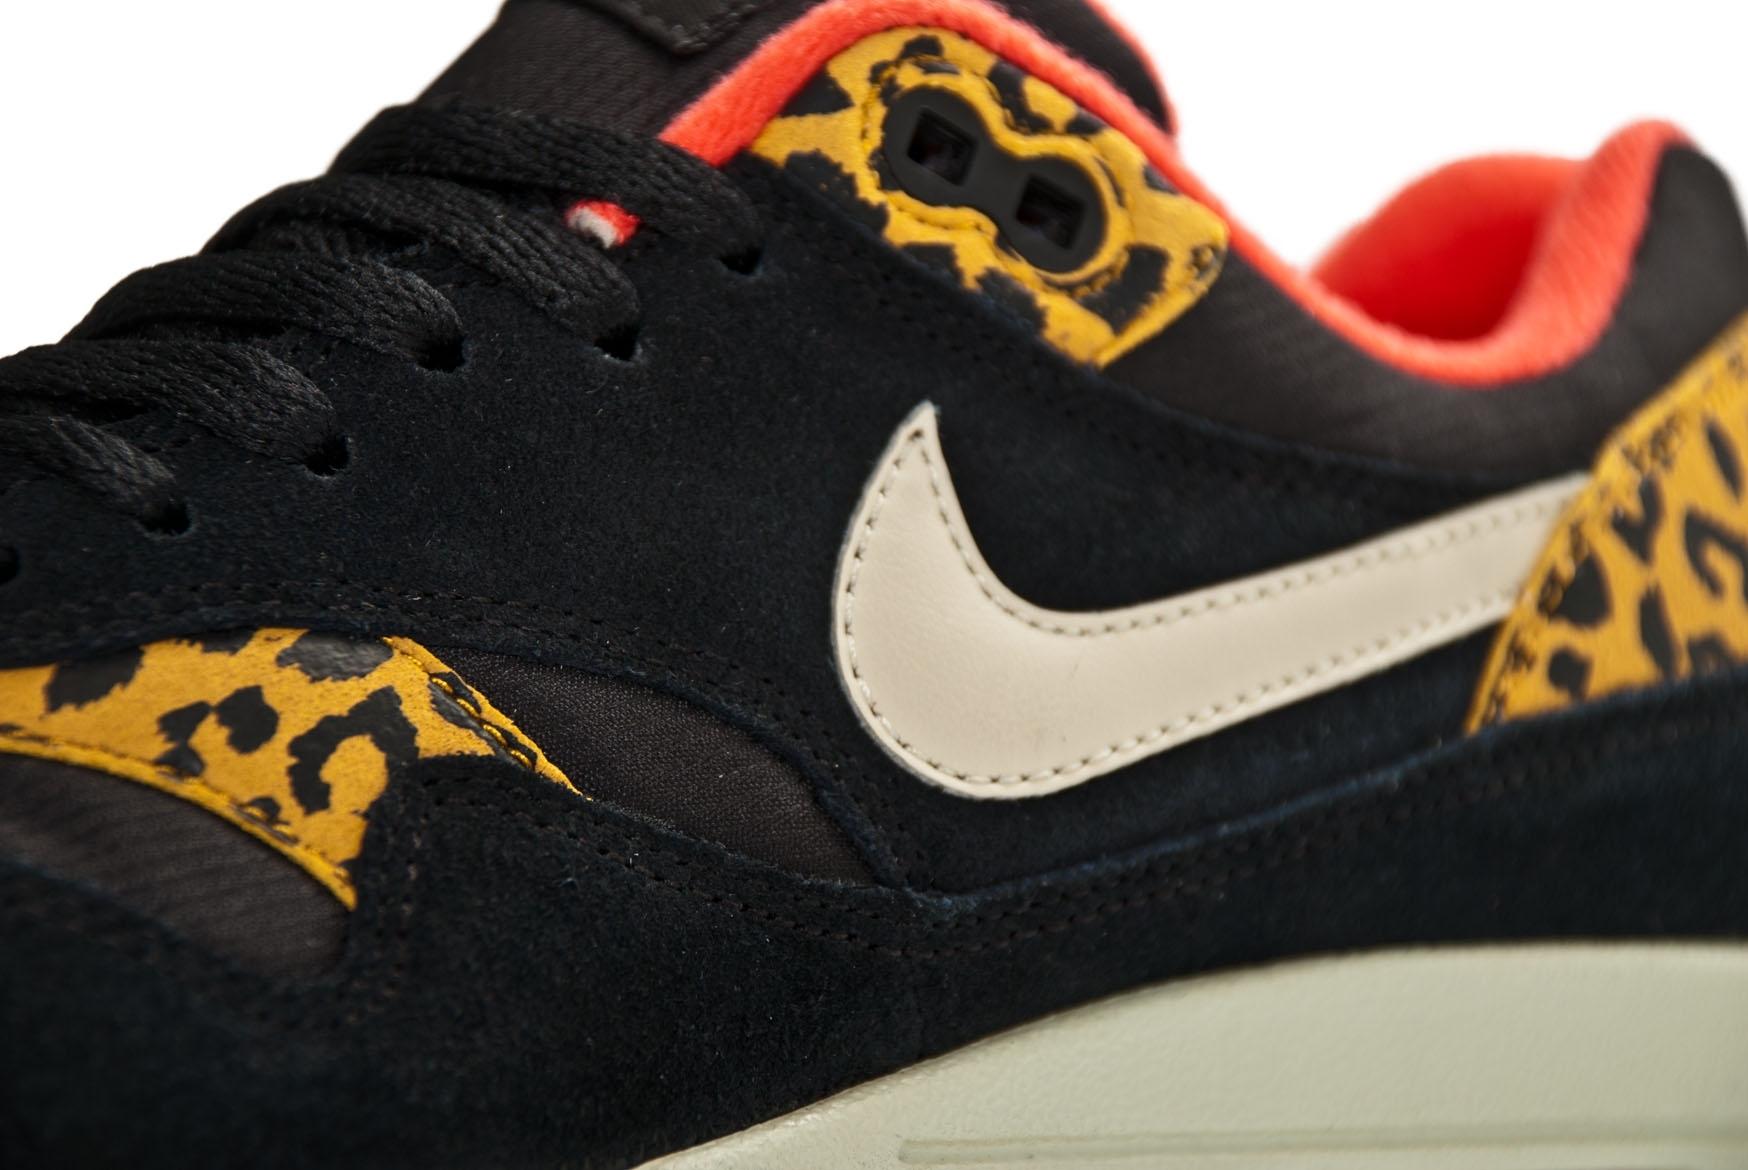 separation shoes 9f893 1b676 Nike Wmns Air Max 1 319986 026 Black Sandtrap Dark Gold Leaf